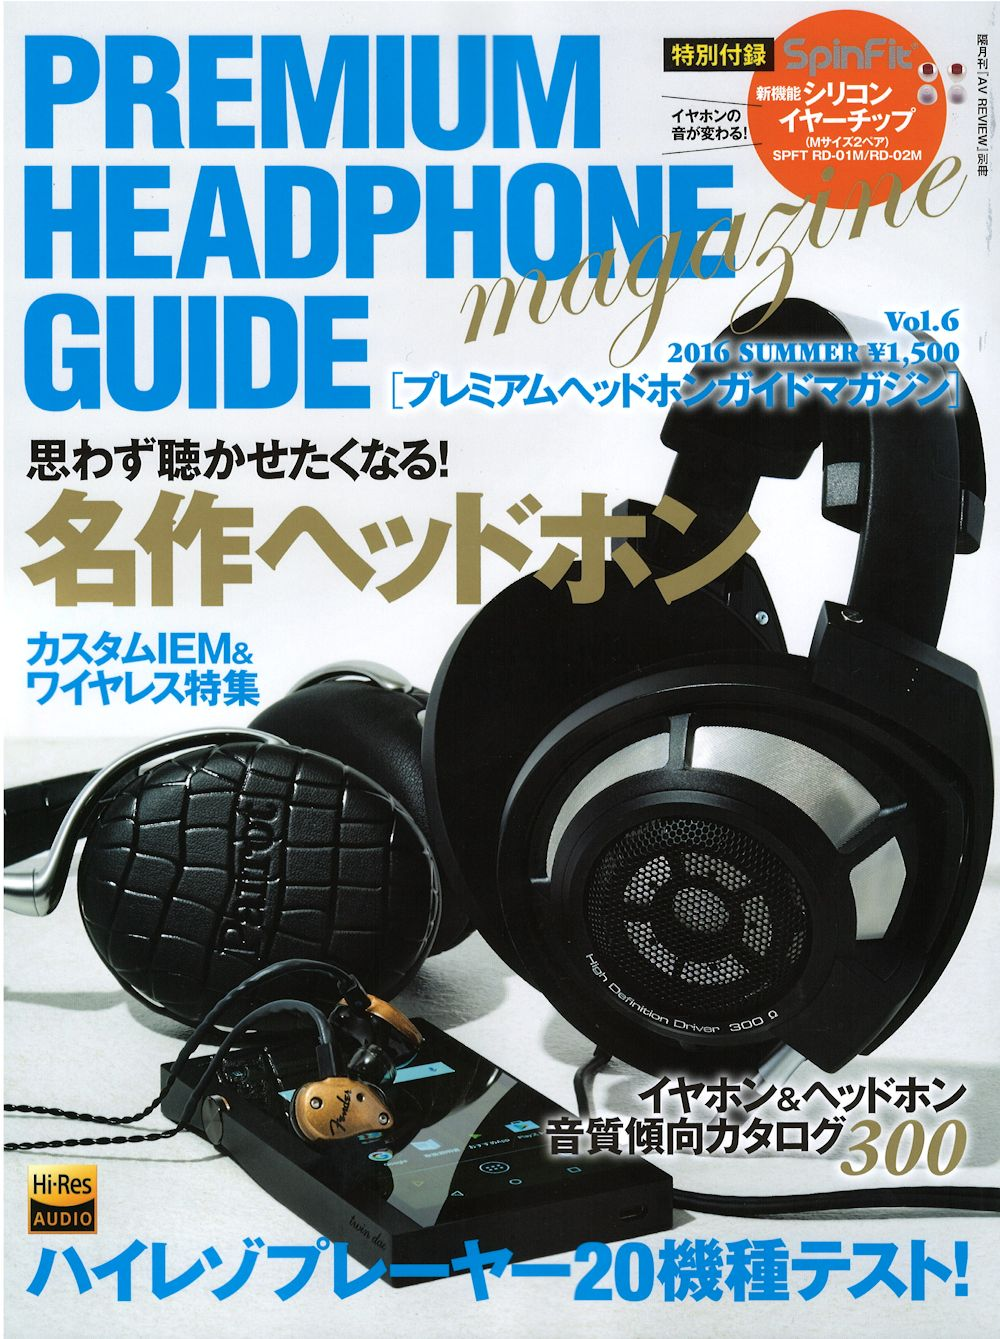 Premium Headphone Guide Magazine Vol6 に、AR-M20レビューと開発担当者のインタビューが掲載されました。